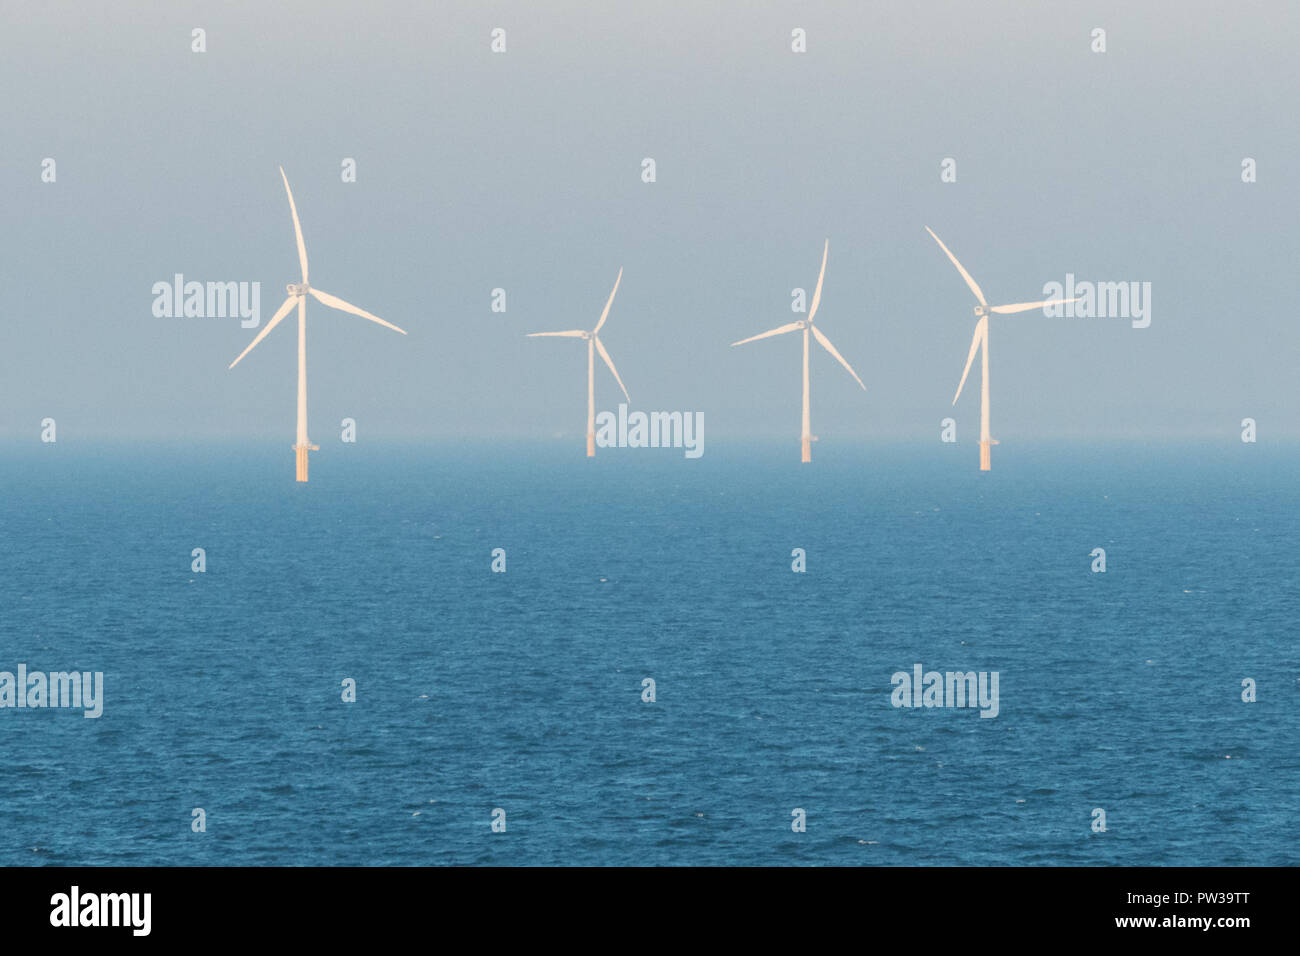 wind turbines offshore - Stock Image